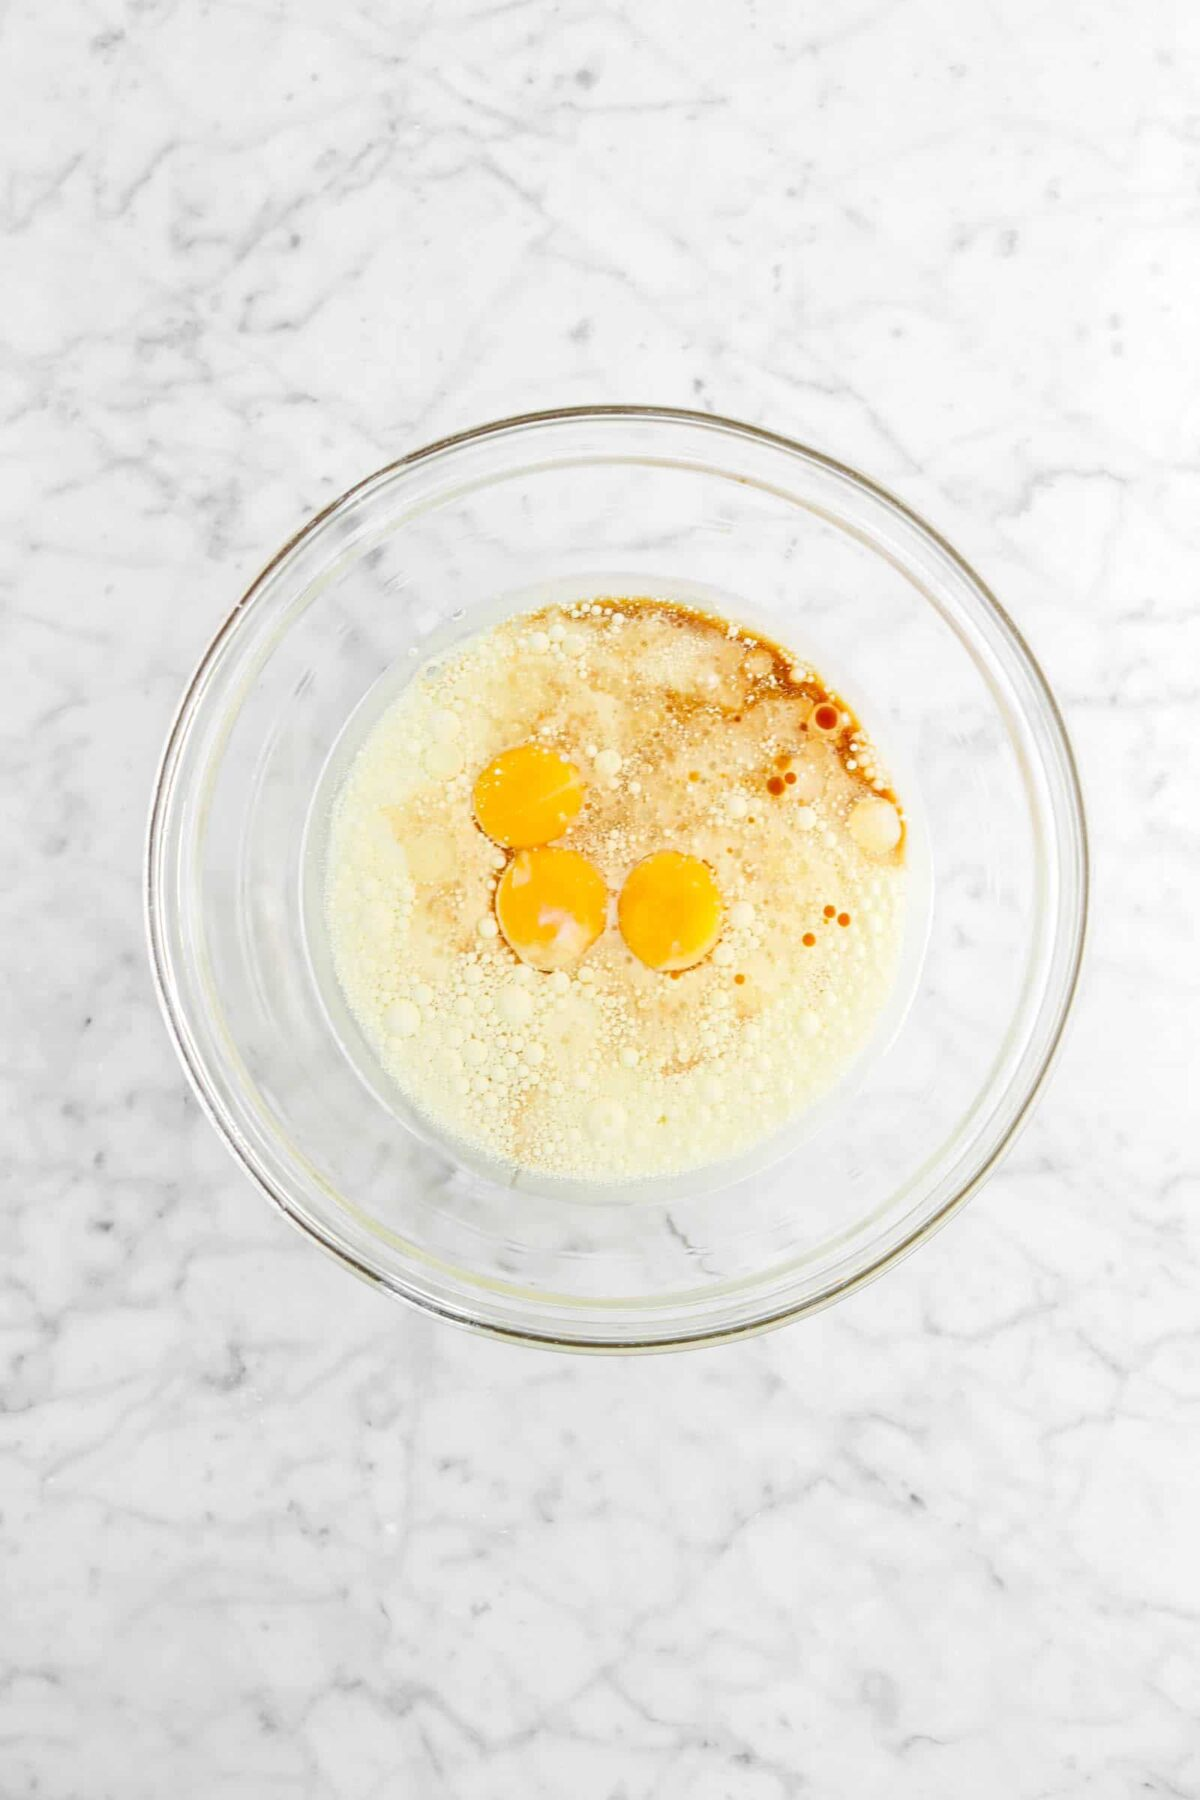 egg yolks, vanilla, milk, vanilla, and oil in glass bowl